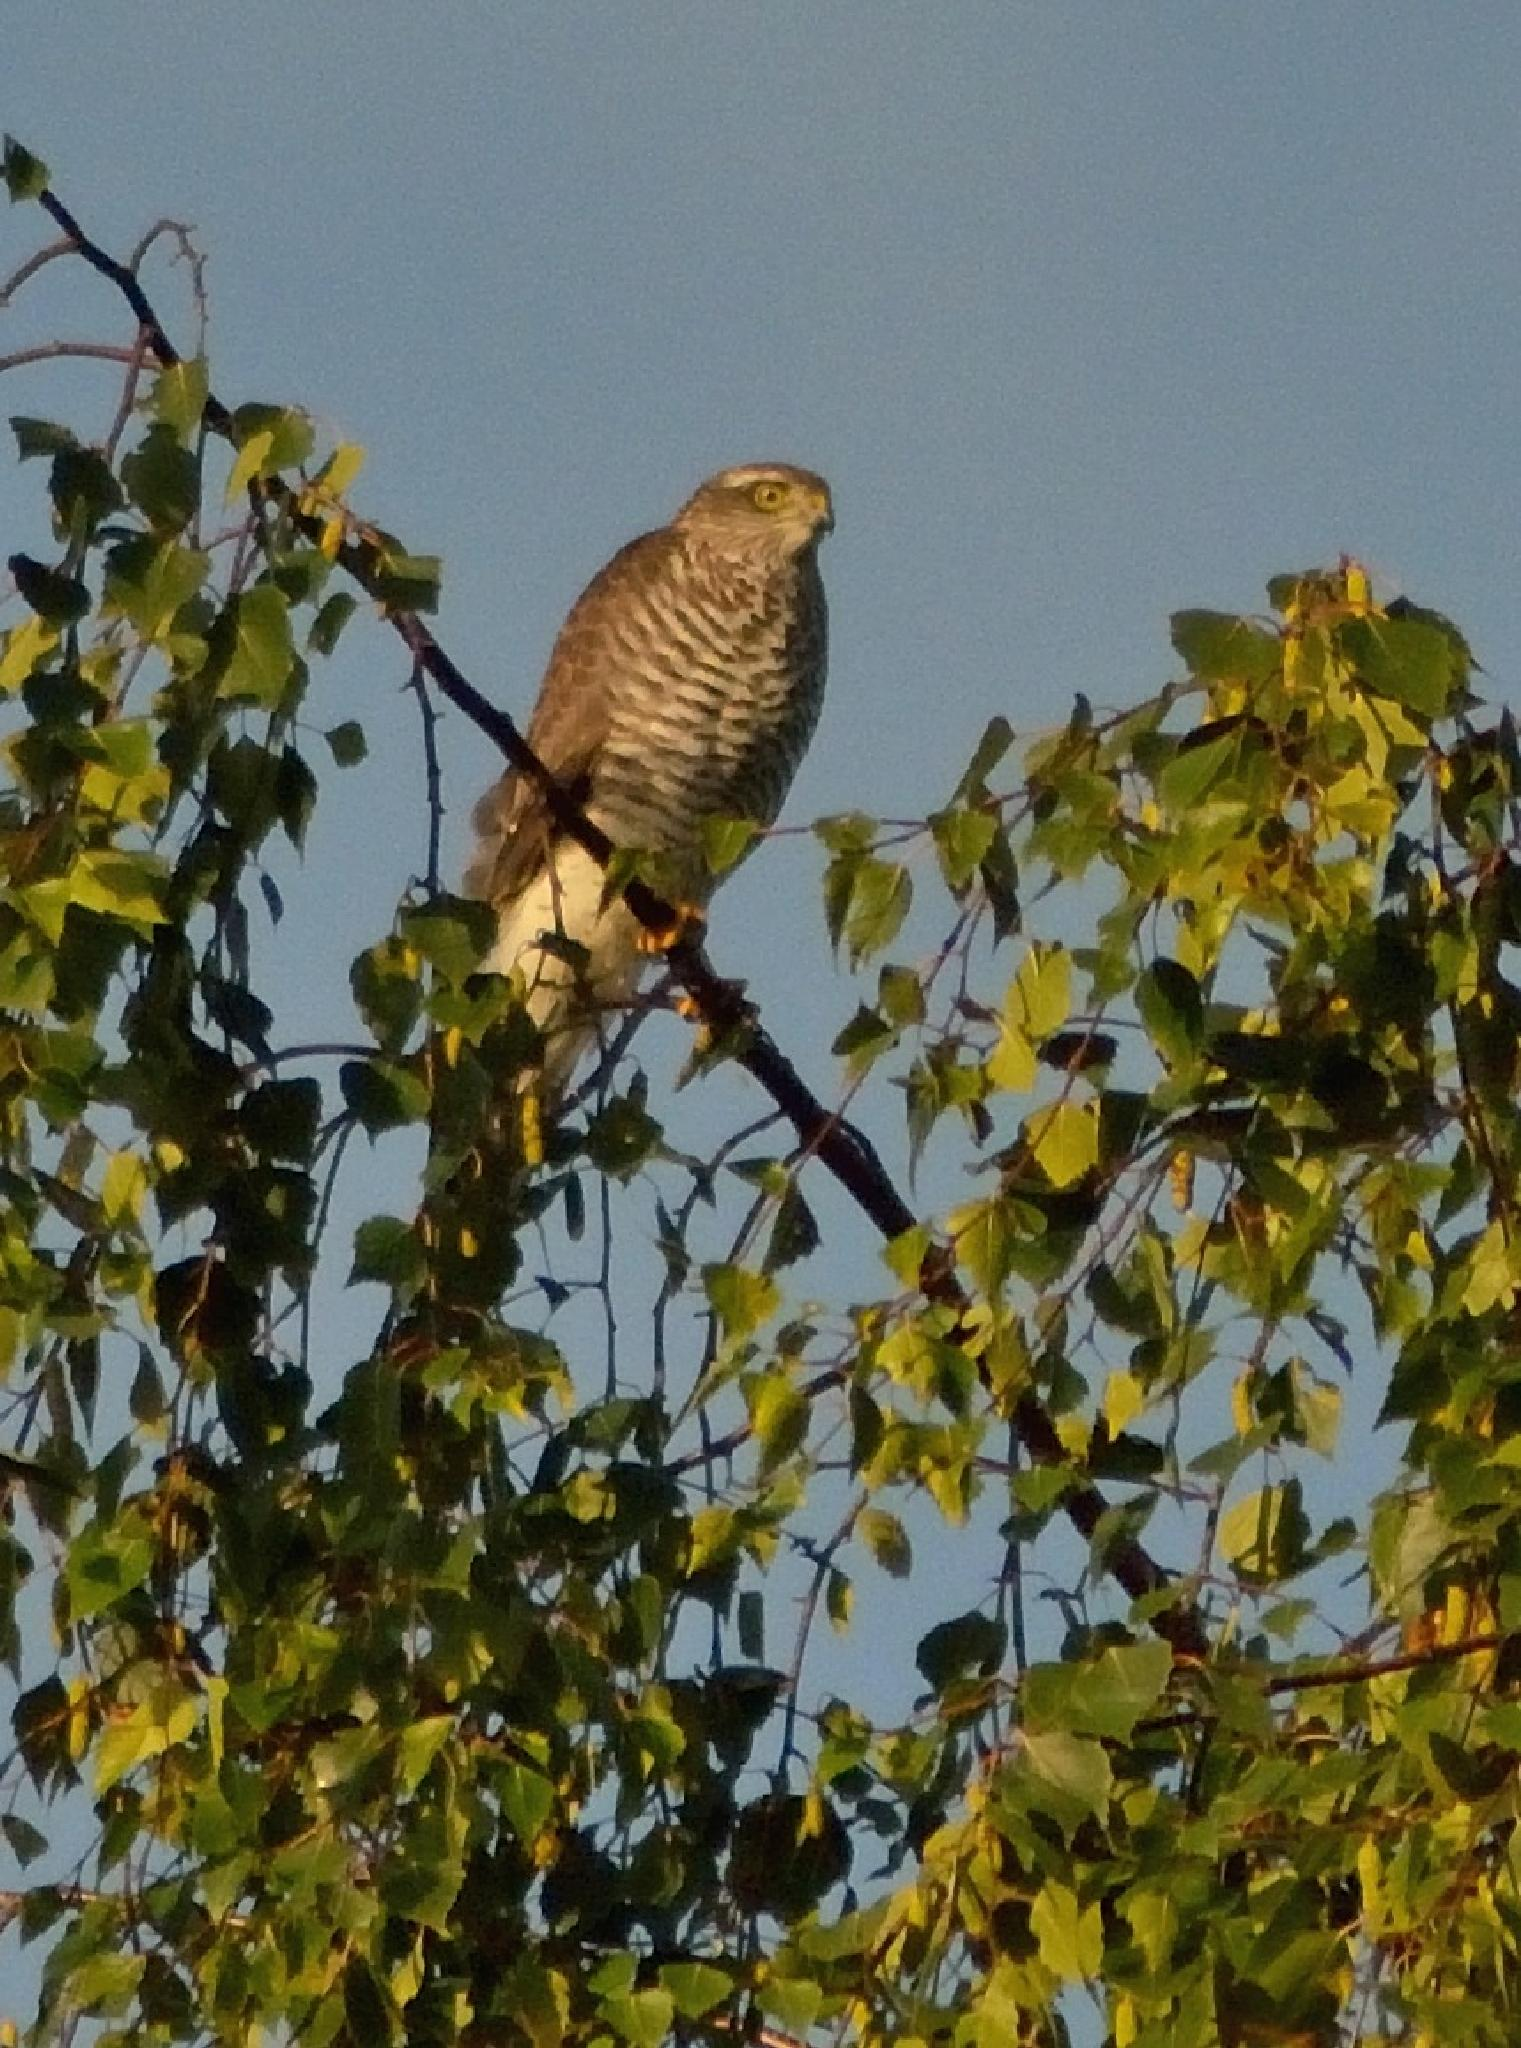 Sperwer / Sparrow-Hawk by Henk Meima